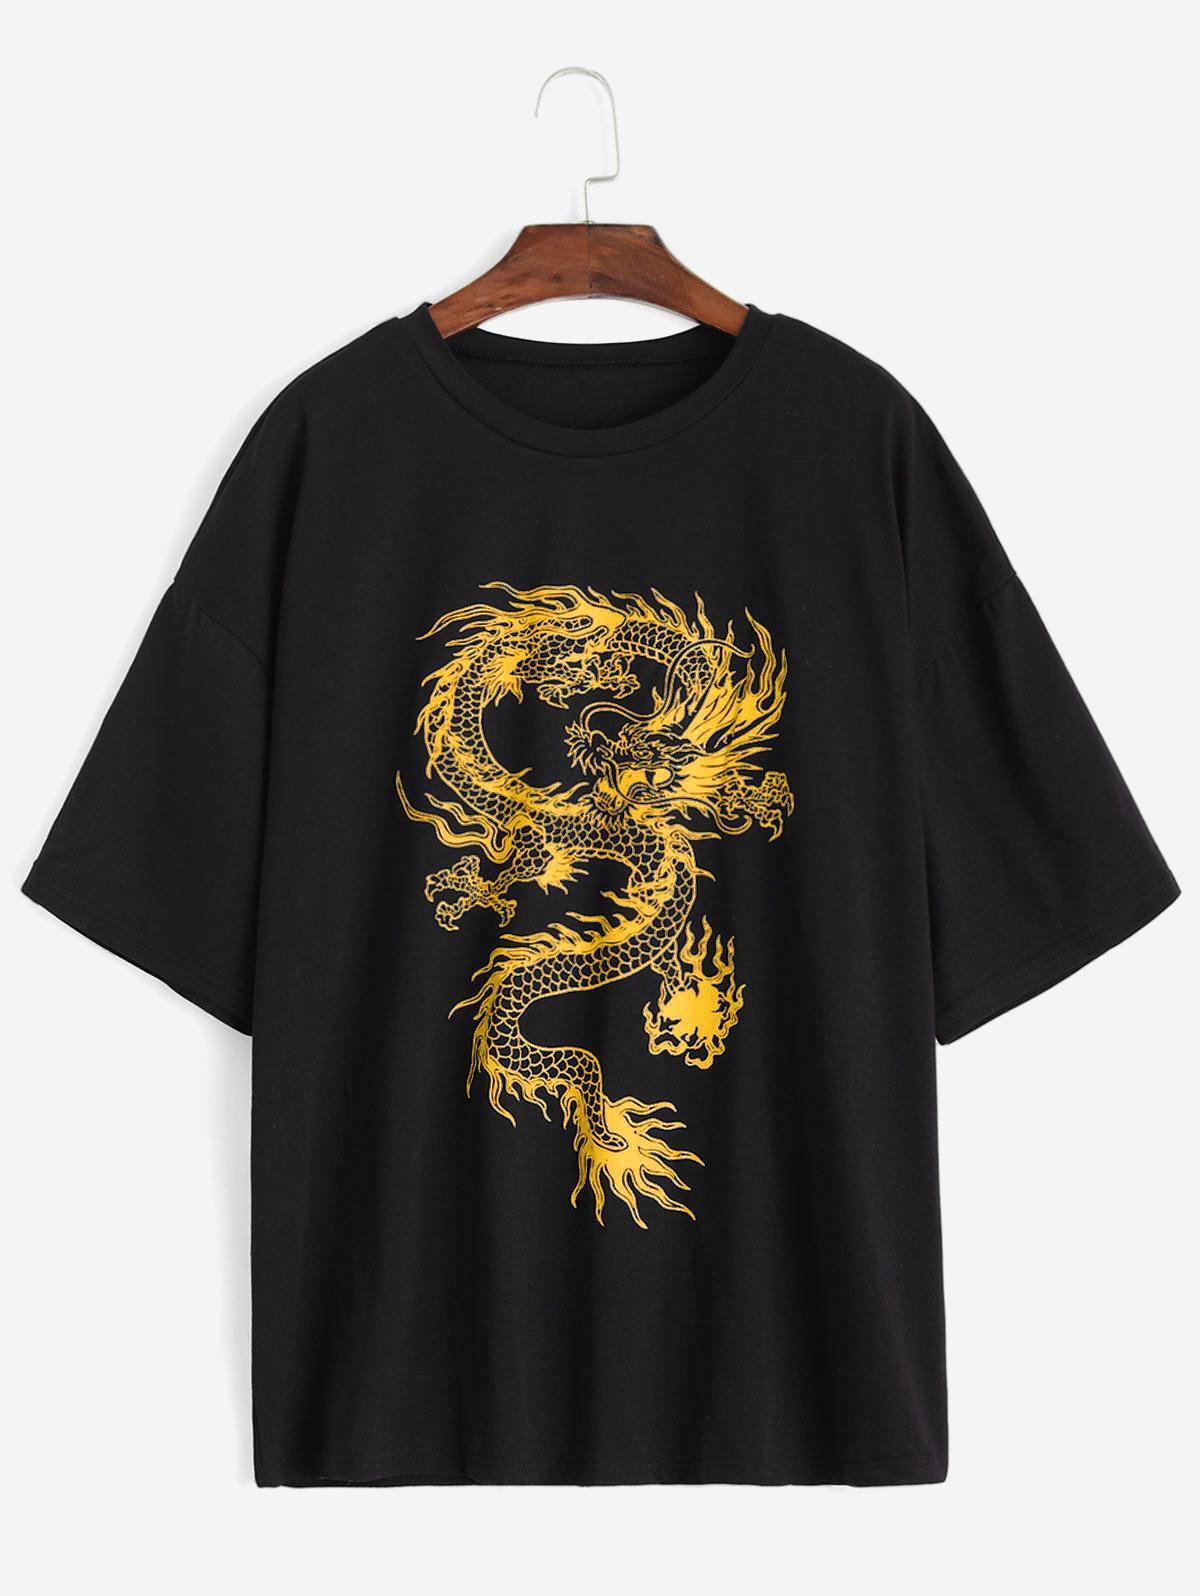 Dragon Print Round Neck Short Sleeves Tee